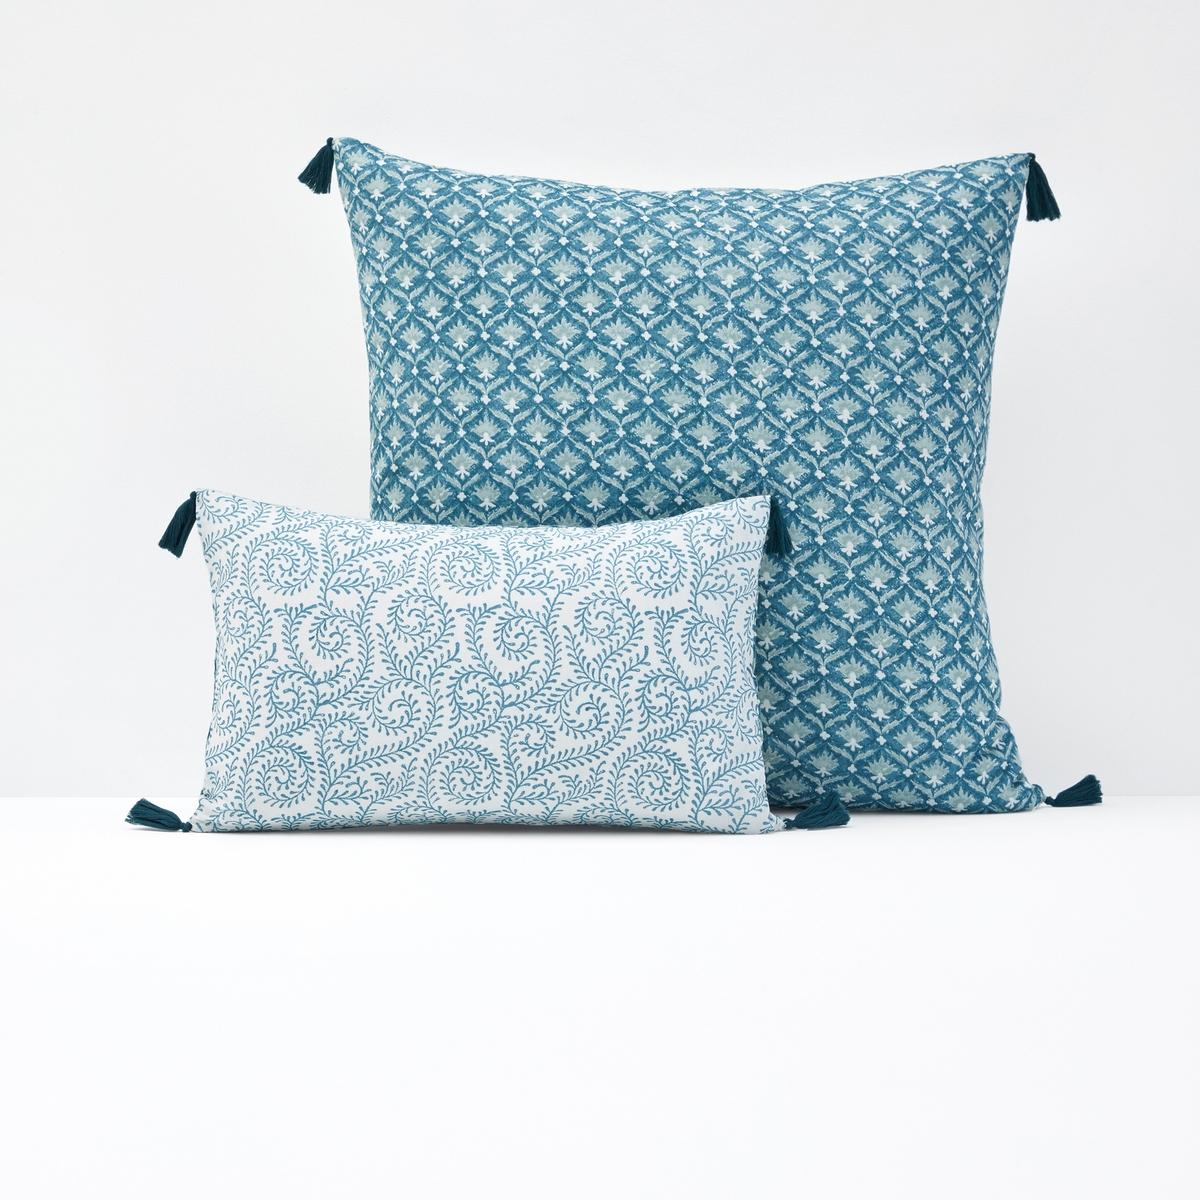 Чехол La Redoute Для подушки или наволочка ODISHA 65 x 65 см синий чехол la redoute для подушки или наволочка однотонного цвета с помпонами riad 65 x 65 см розовый